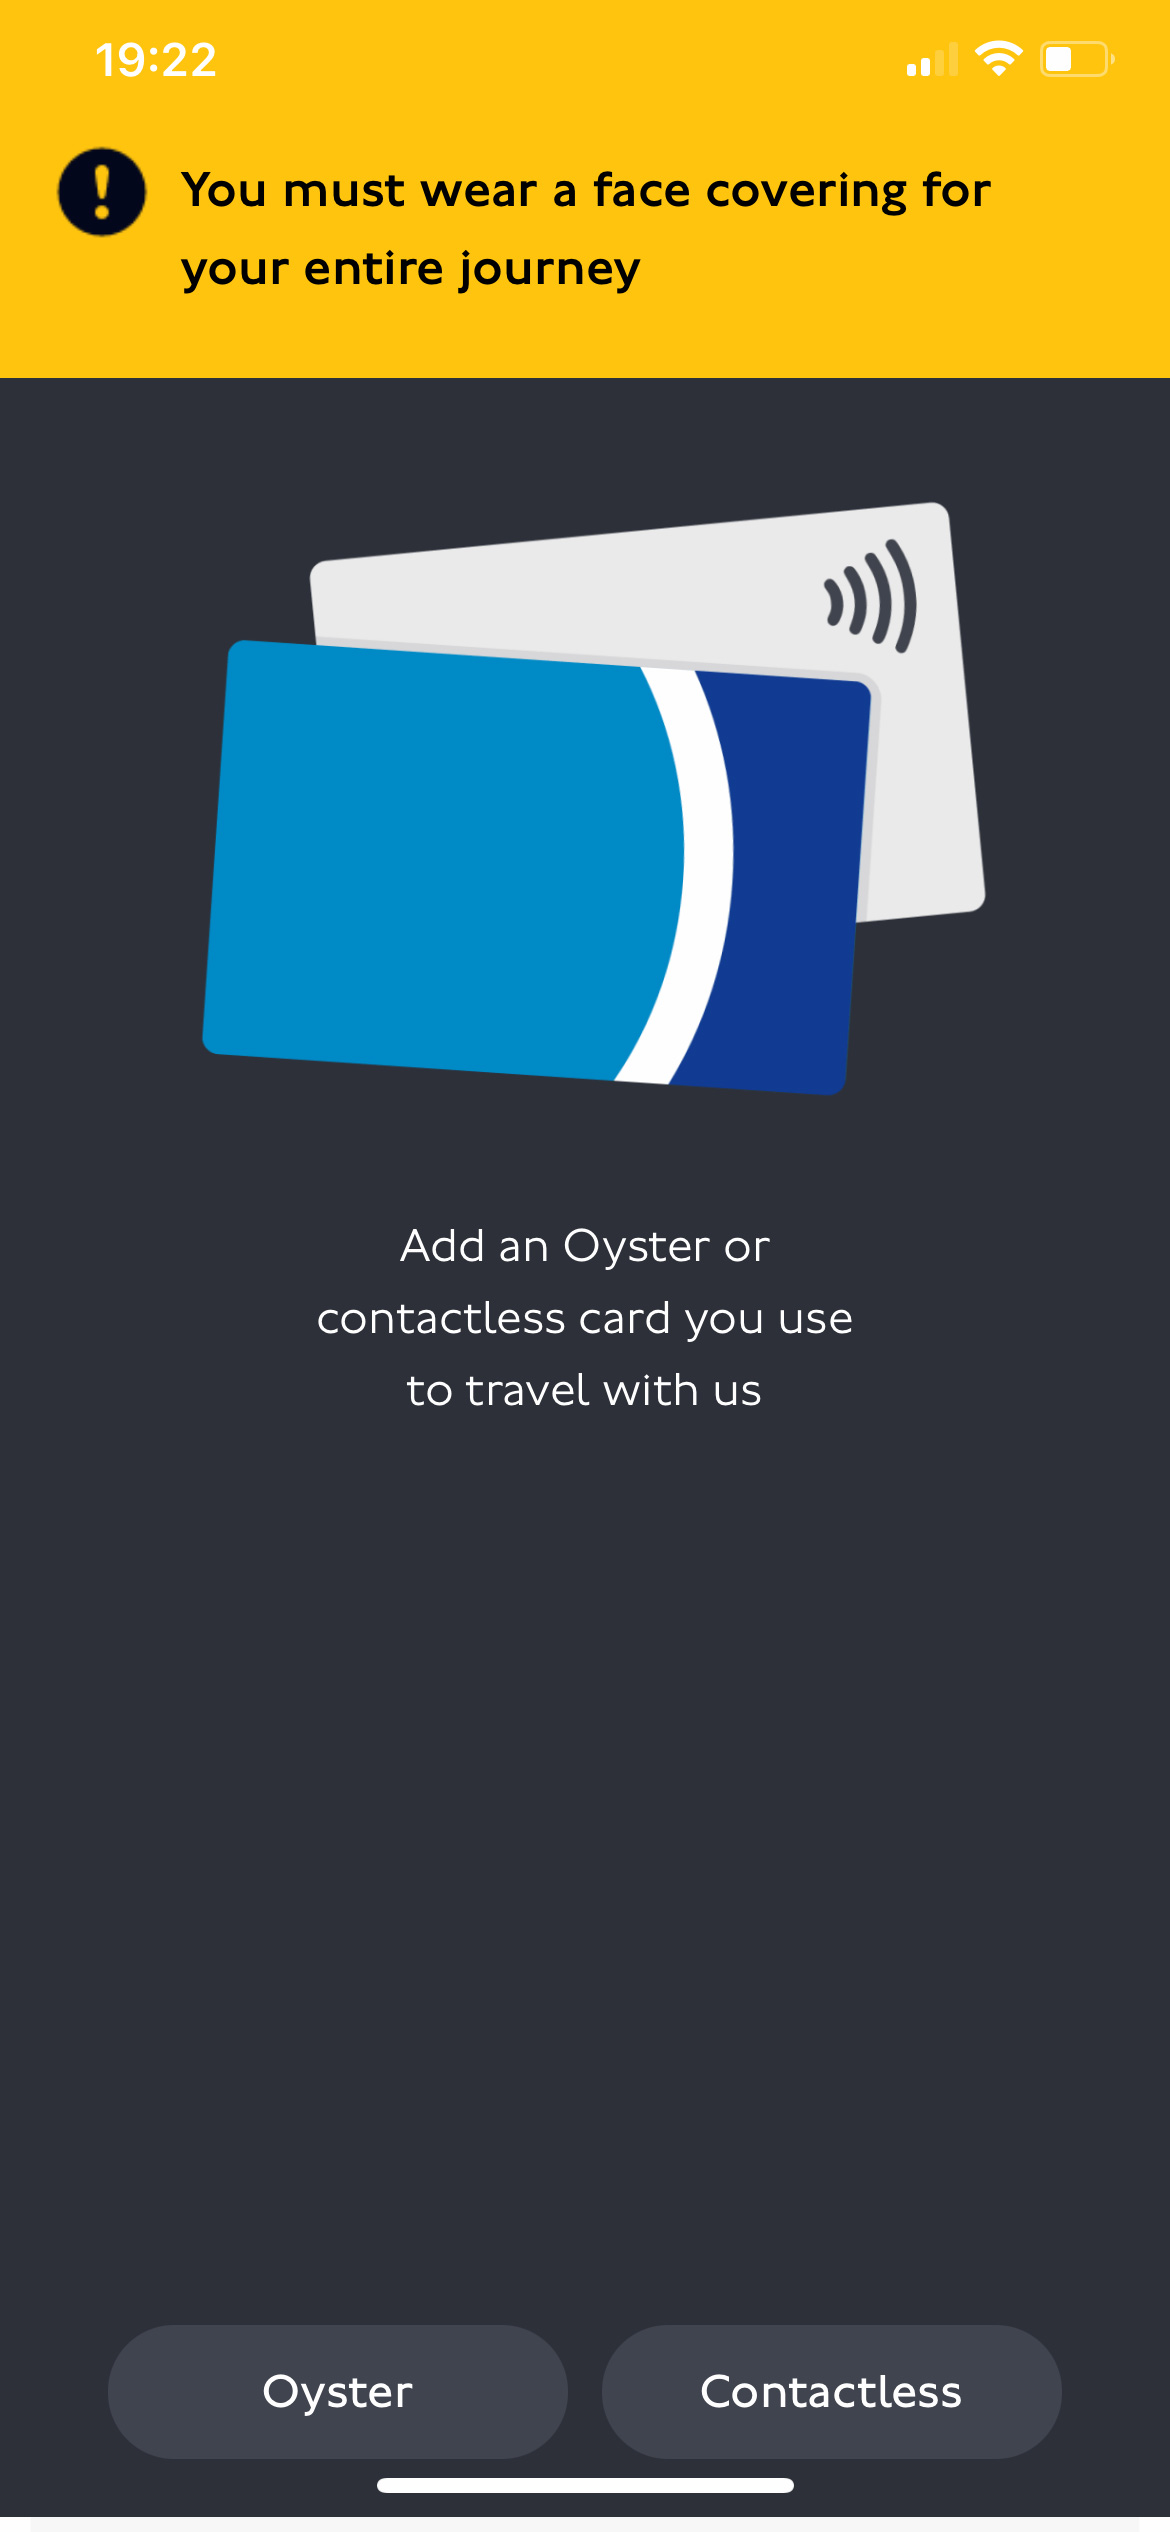 倫敦地鐵 :下載「TfL Oyster and contactless」APP追蹤交通費